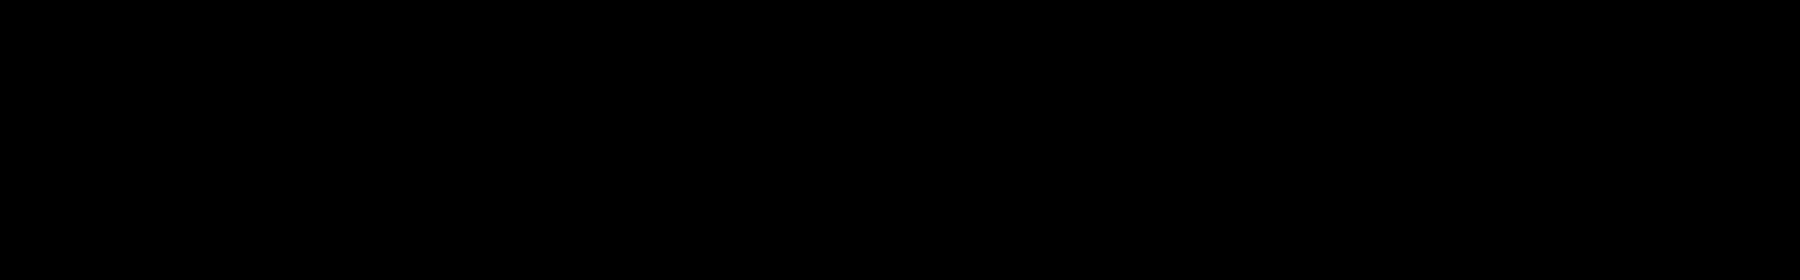 Baker's MIDI 1 audio waveform